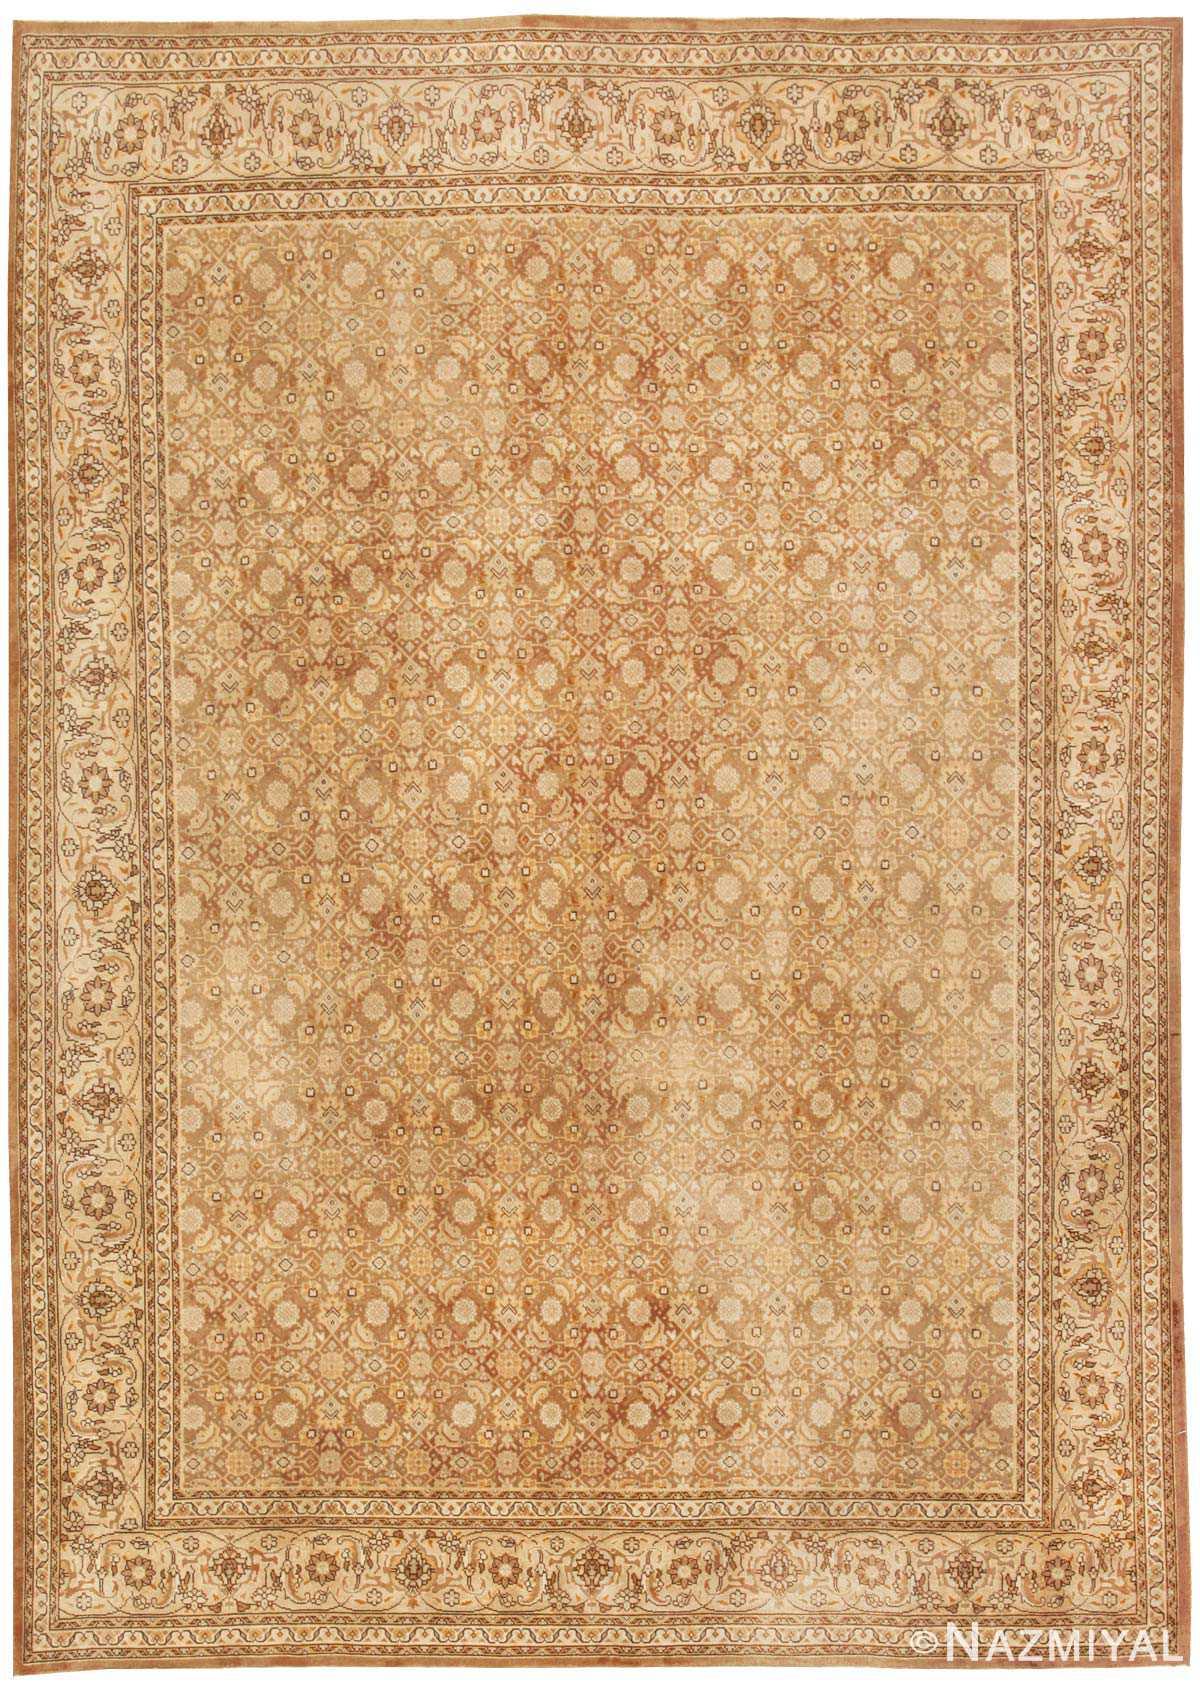 Antique Tabriz Persian Rug 44600 Nazmiyal